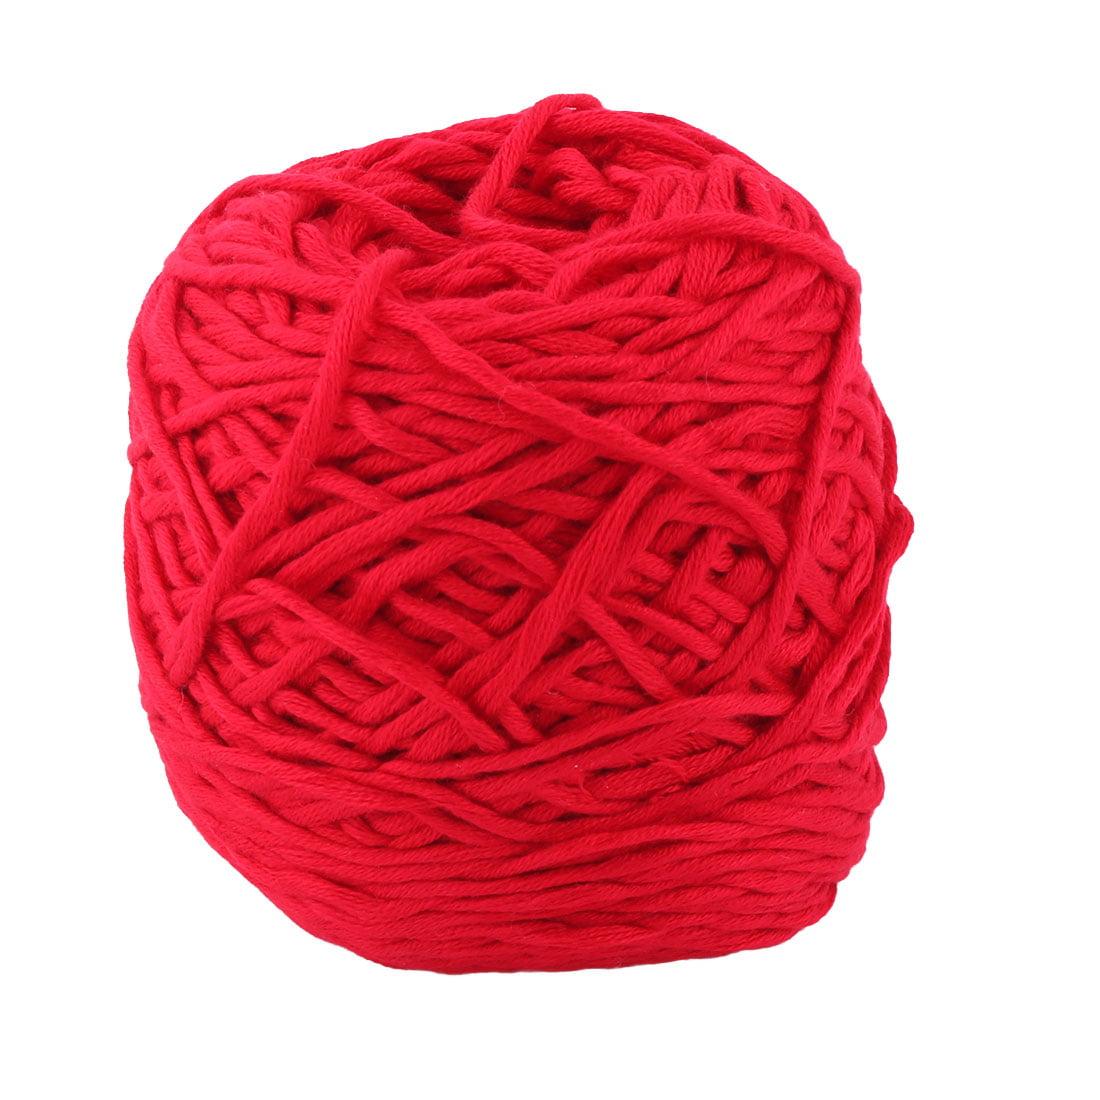 Acrylic Fiber Handmade Crochet Socks Gloves Scarf Knitting Yarn Cord Red 200g